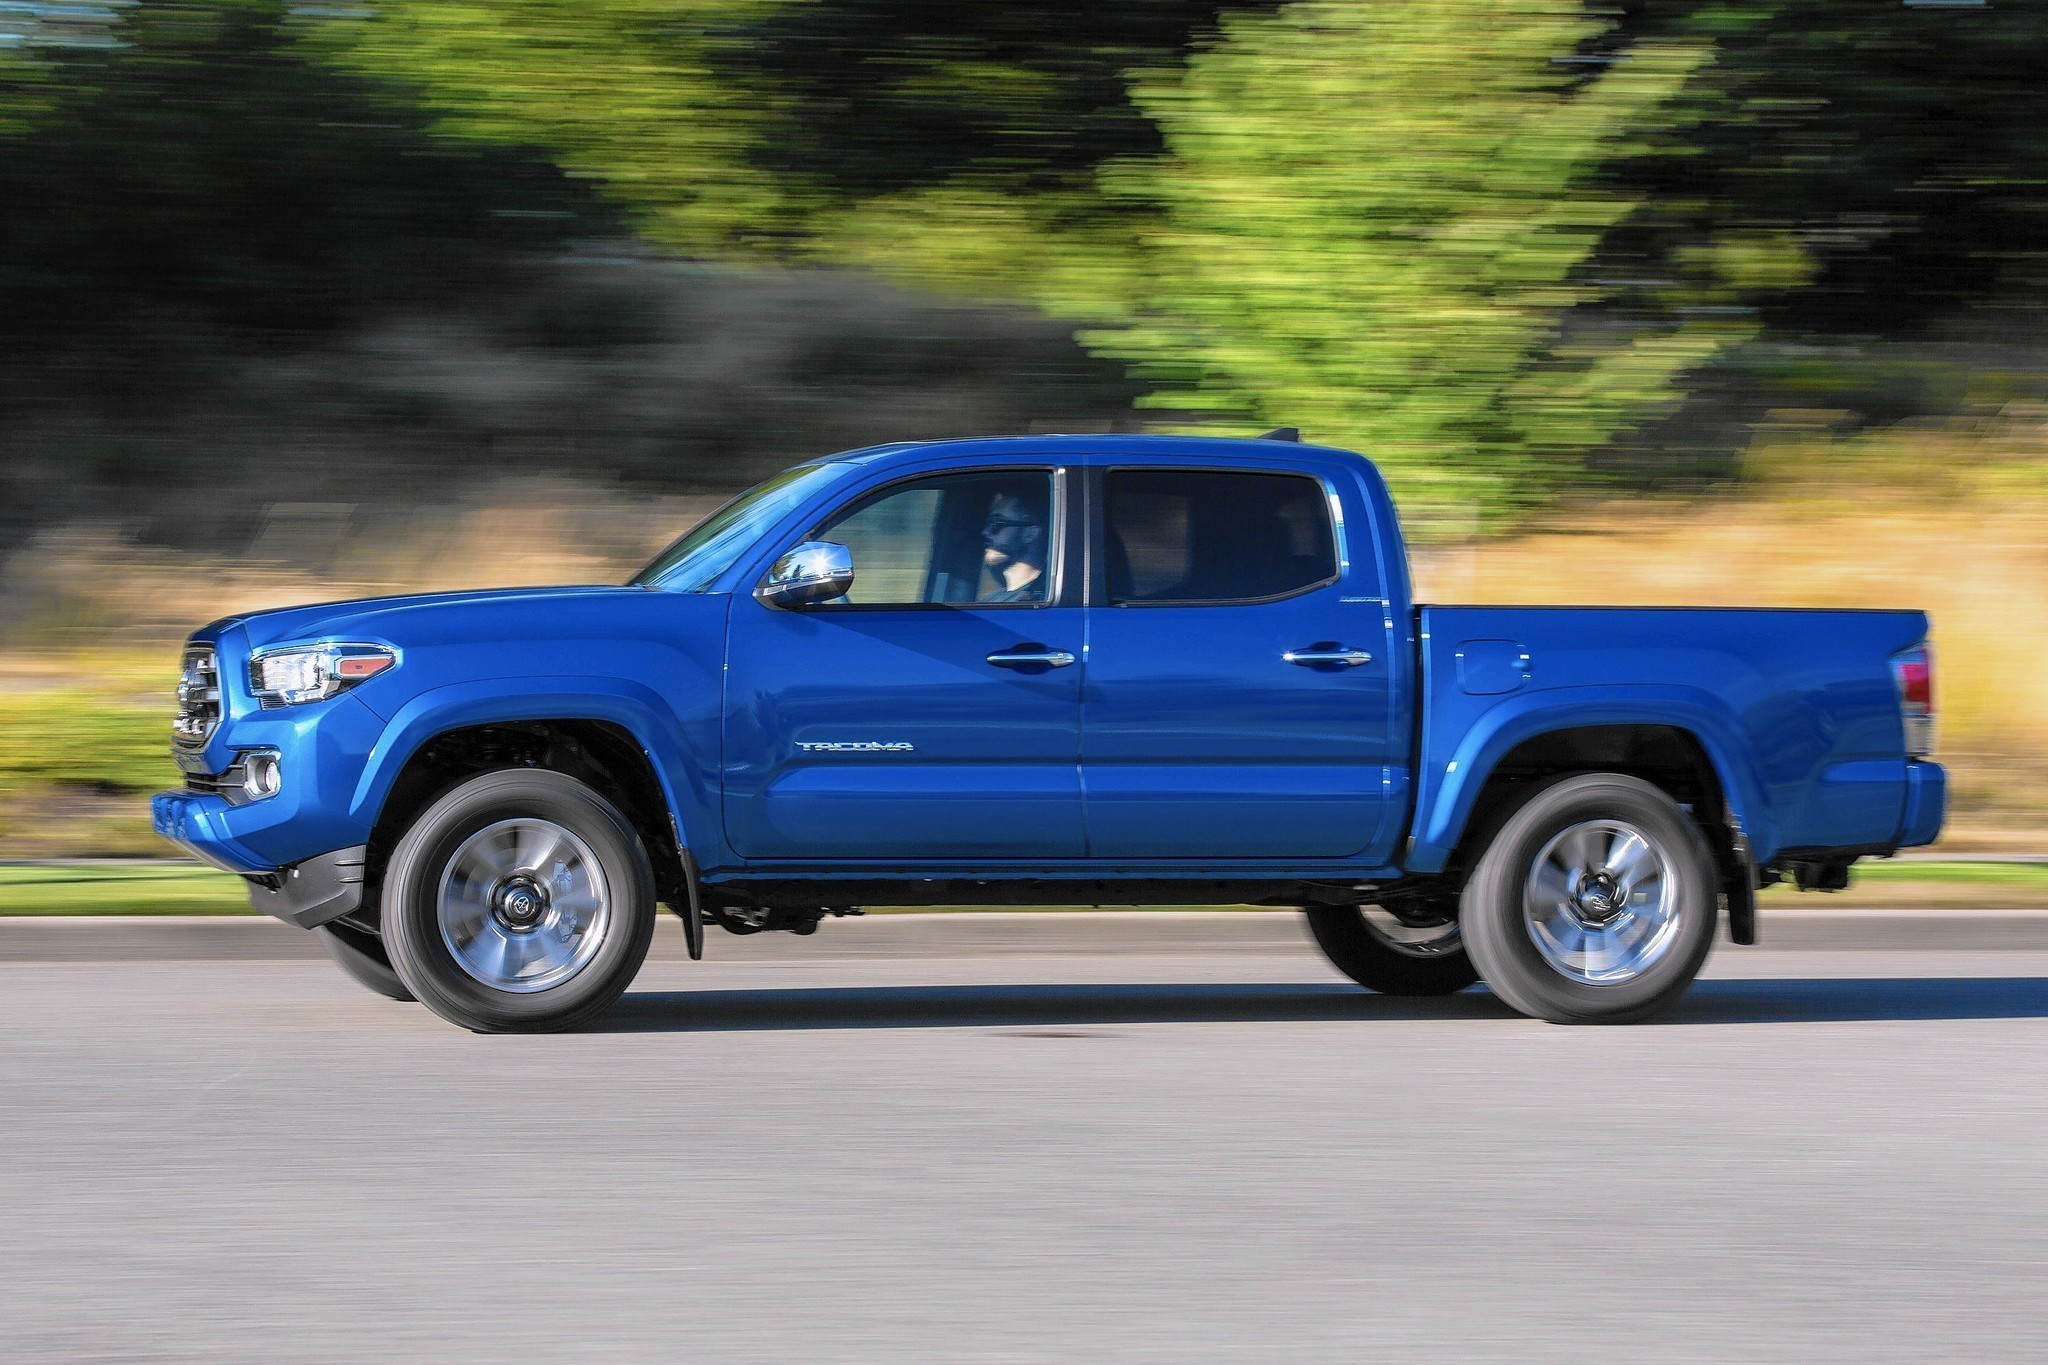 Rugged Toyota Tacoma midsize pickup returns with new design, new power - Chicago Tribune